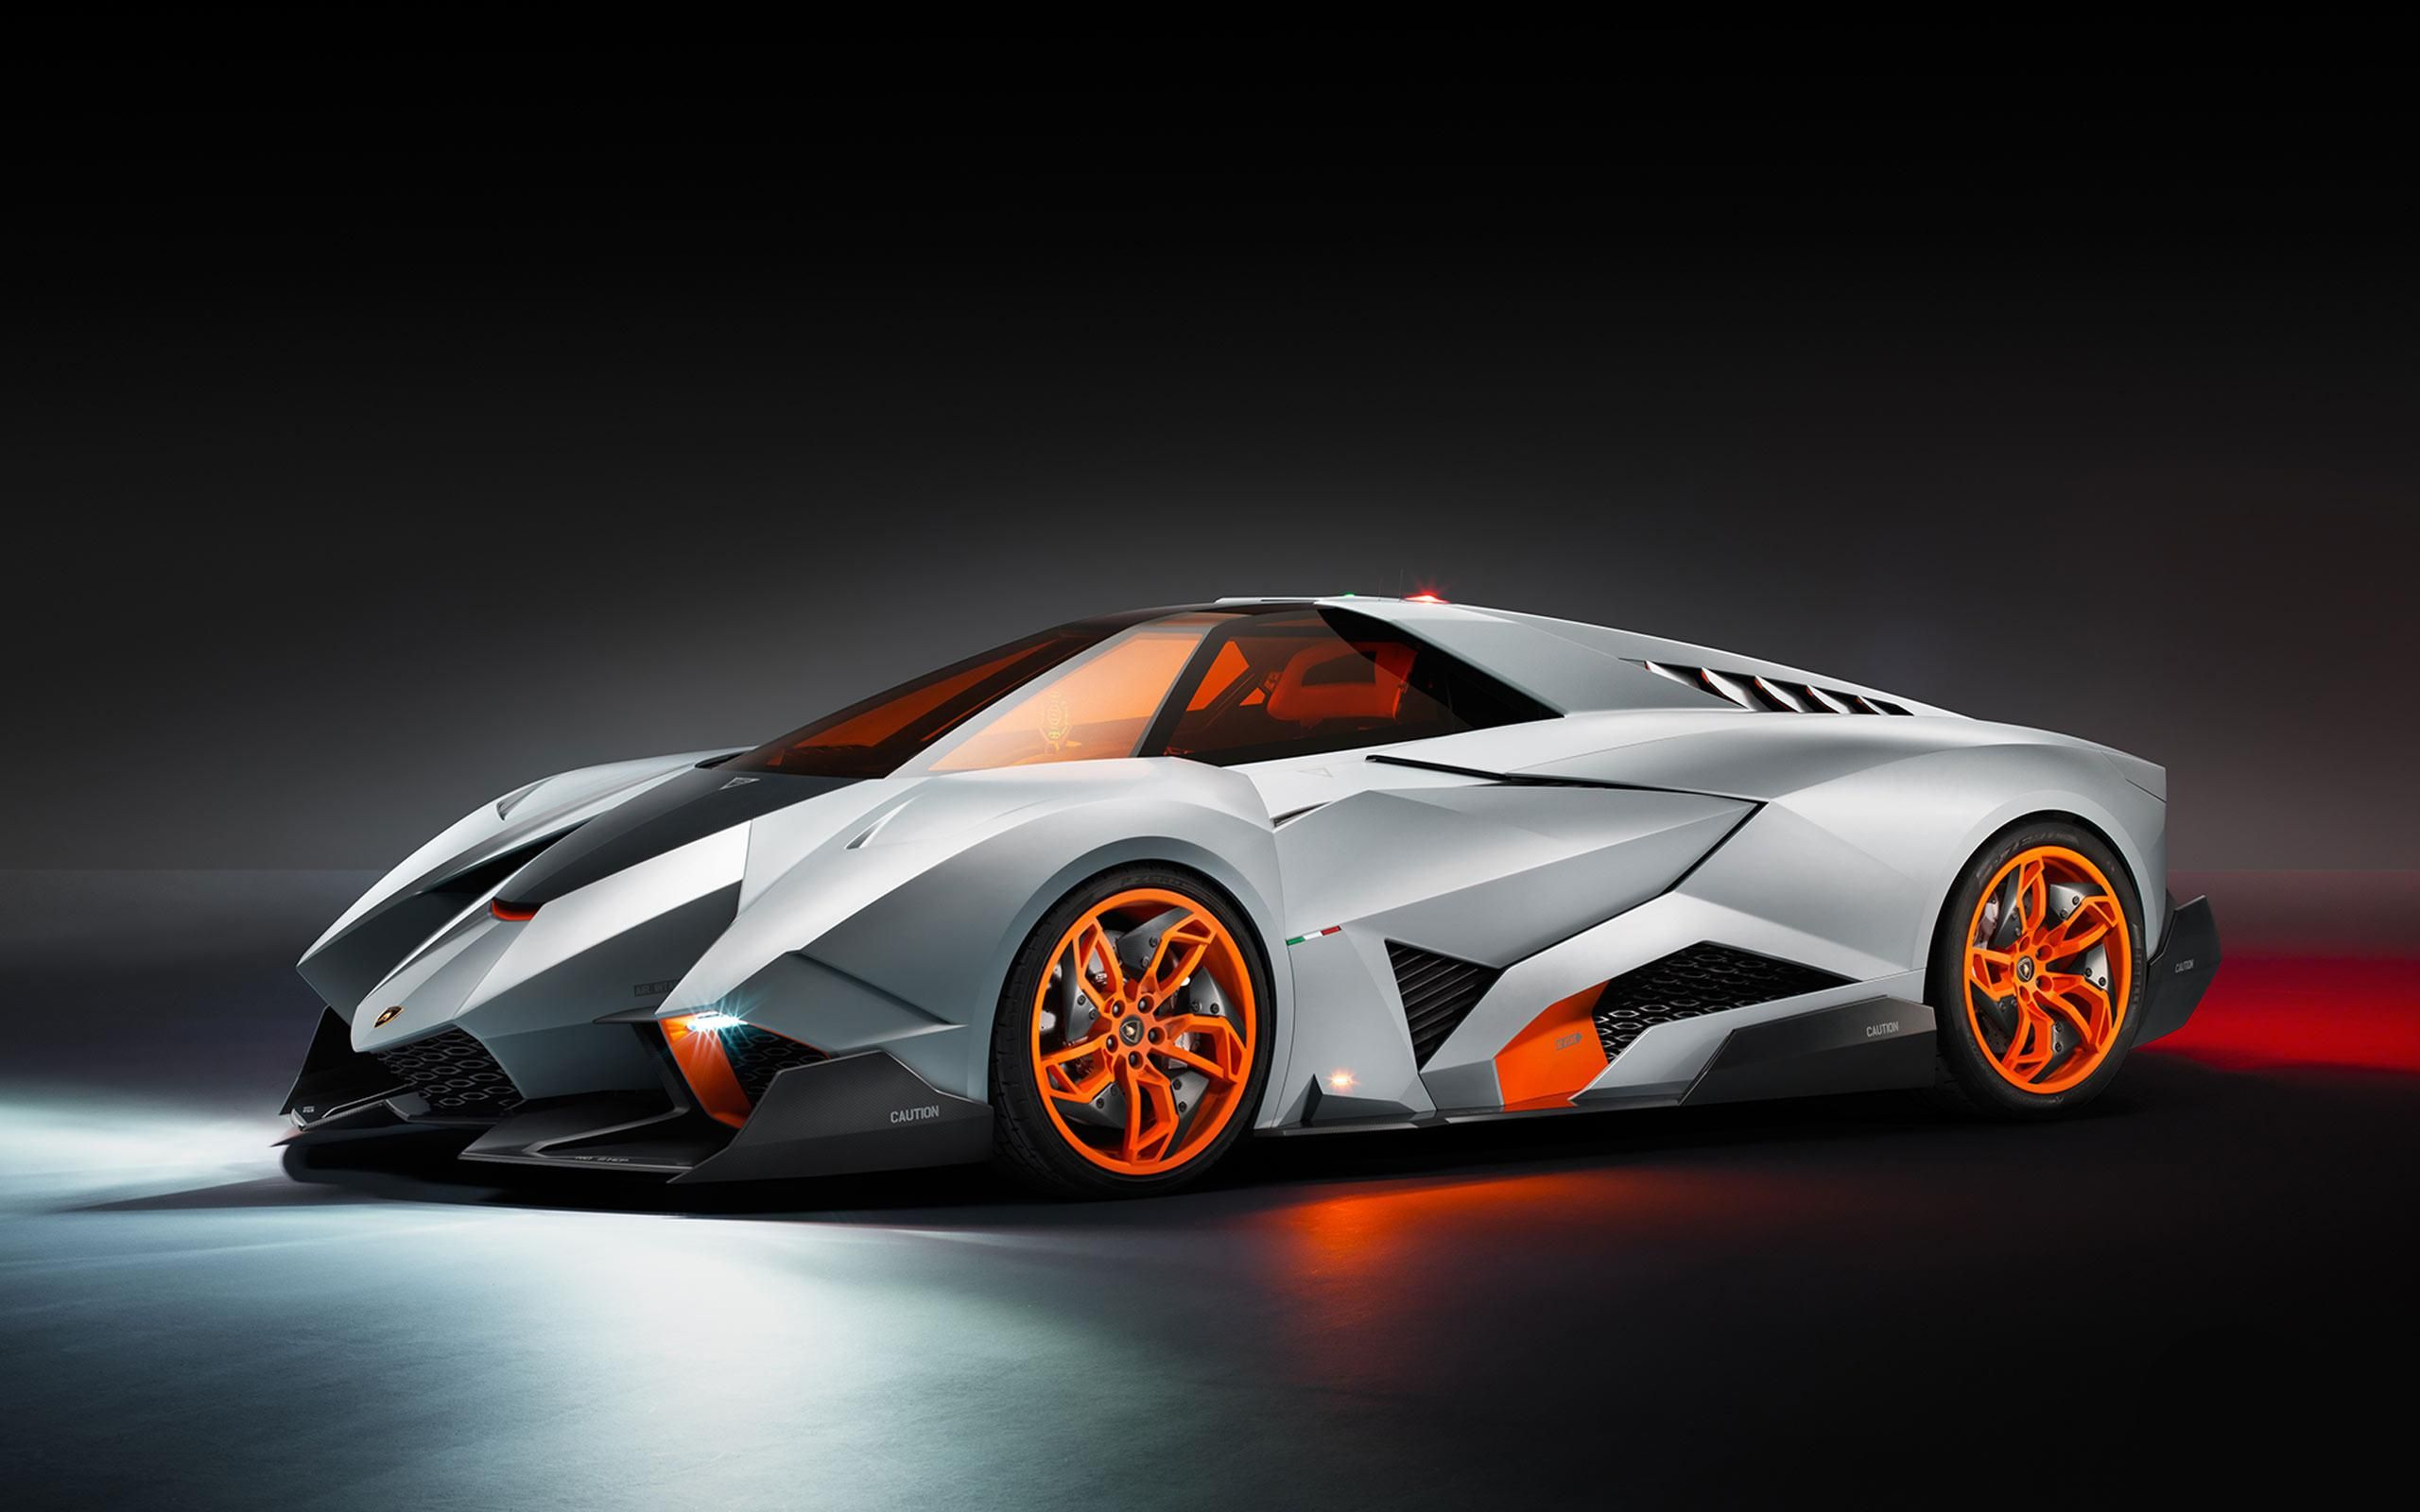 Ordinaire The Lamborghini Egoista Concept Car Is Not A Vehicle That Receives Mild  Responses. Description From